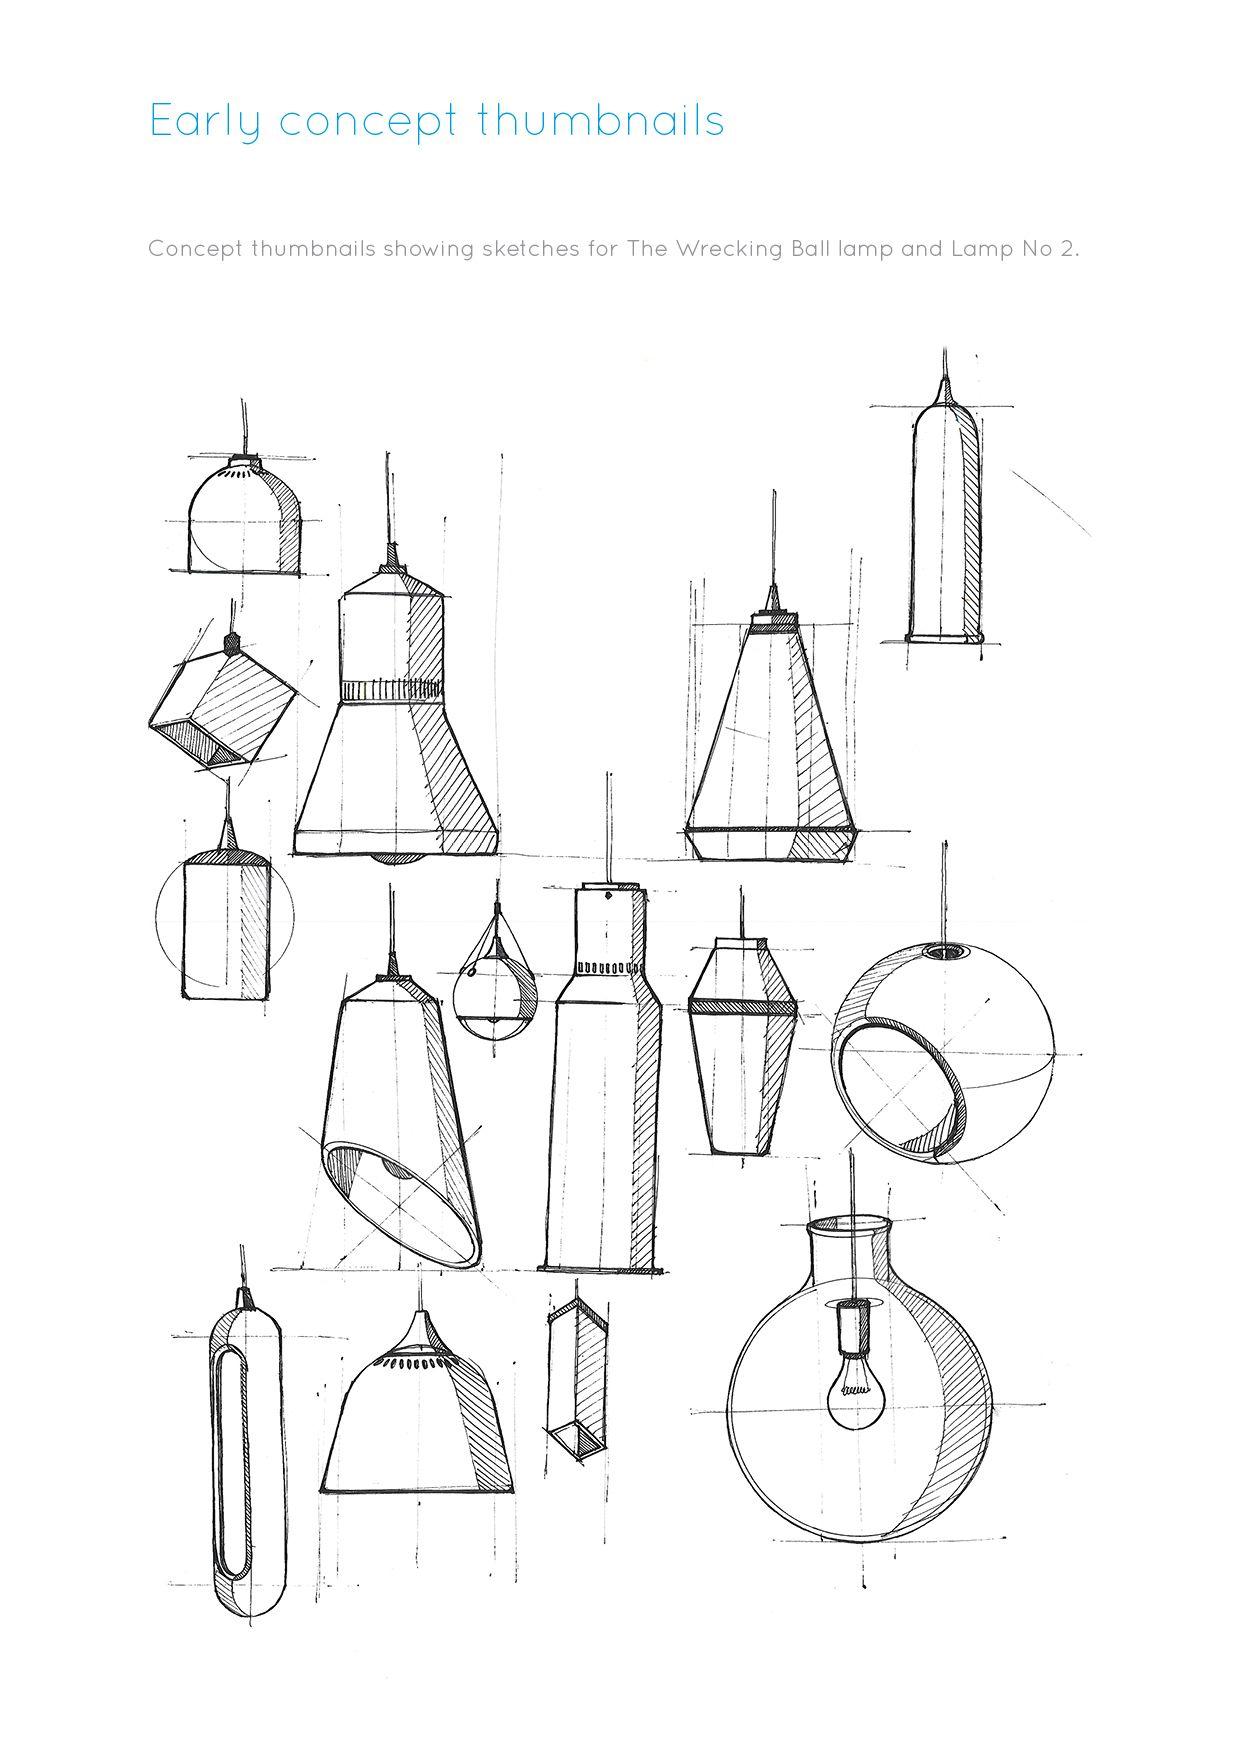 Original 300136 Dxbuik23lgeyhqtps6q6wzvxd Jpg 1240 1754 Furniture Design Sketches Interior Design Drawings Interior Design Sketches